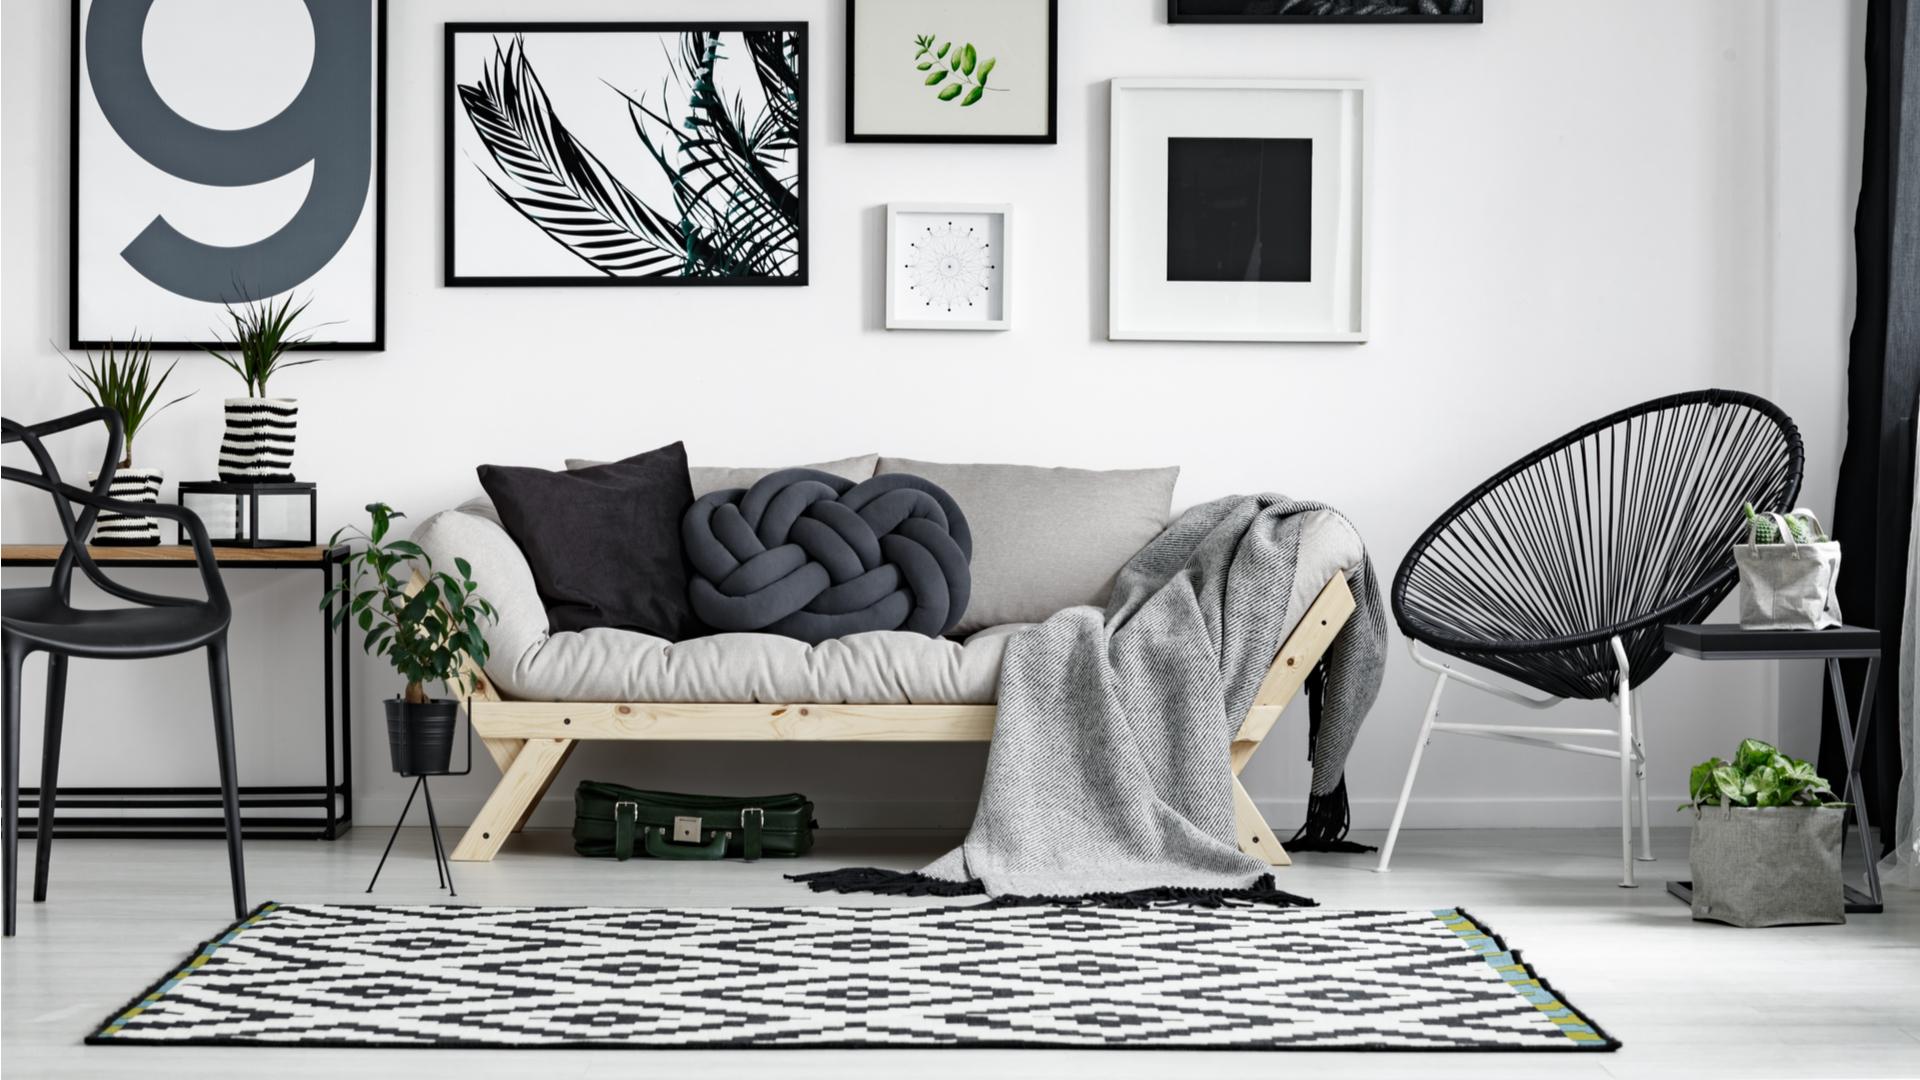 Interior design d cor cae - Hiring an interior designer on a budget ...